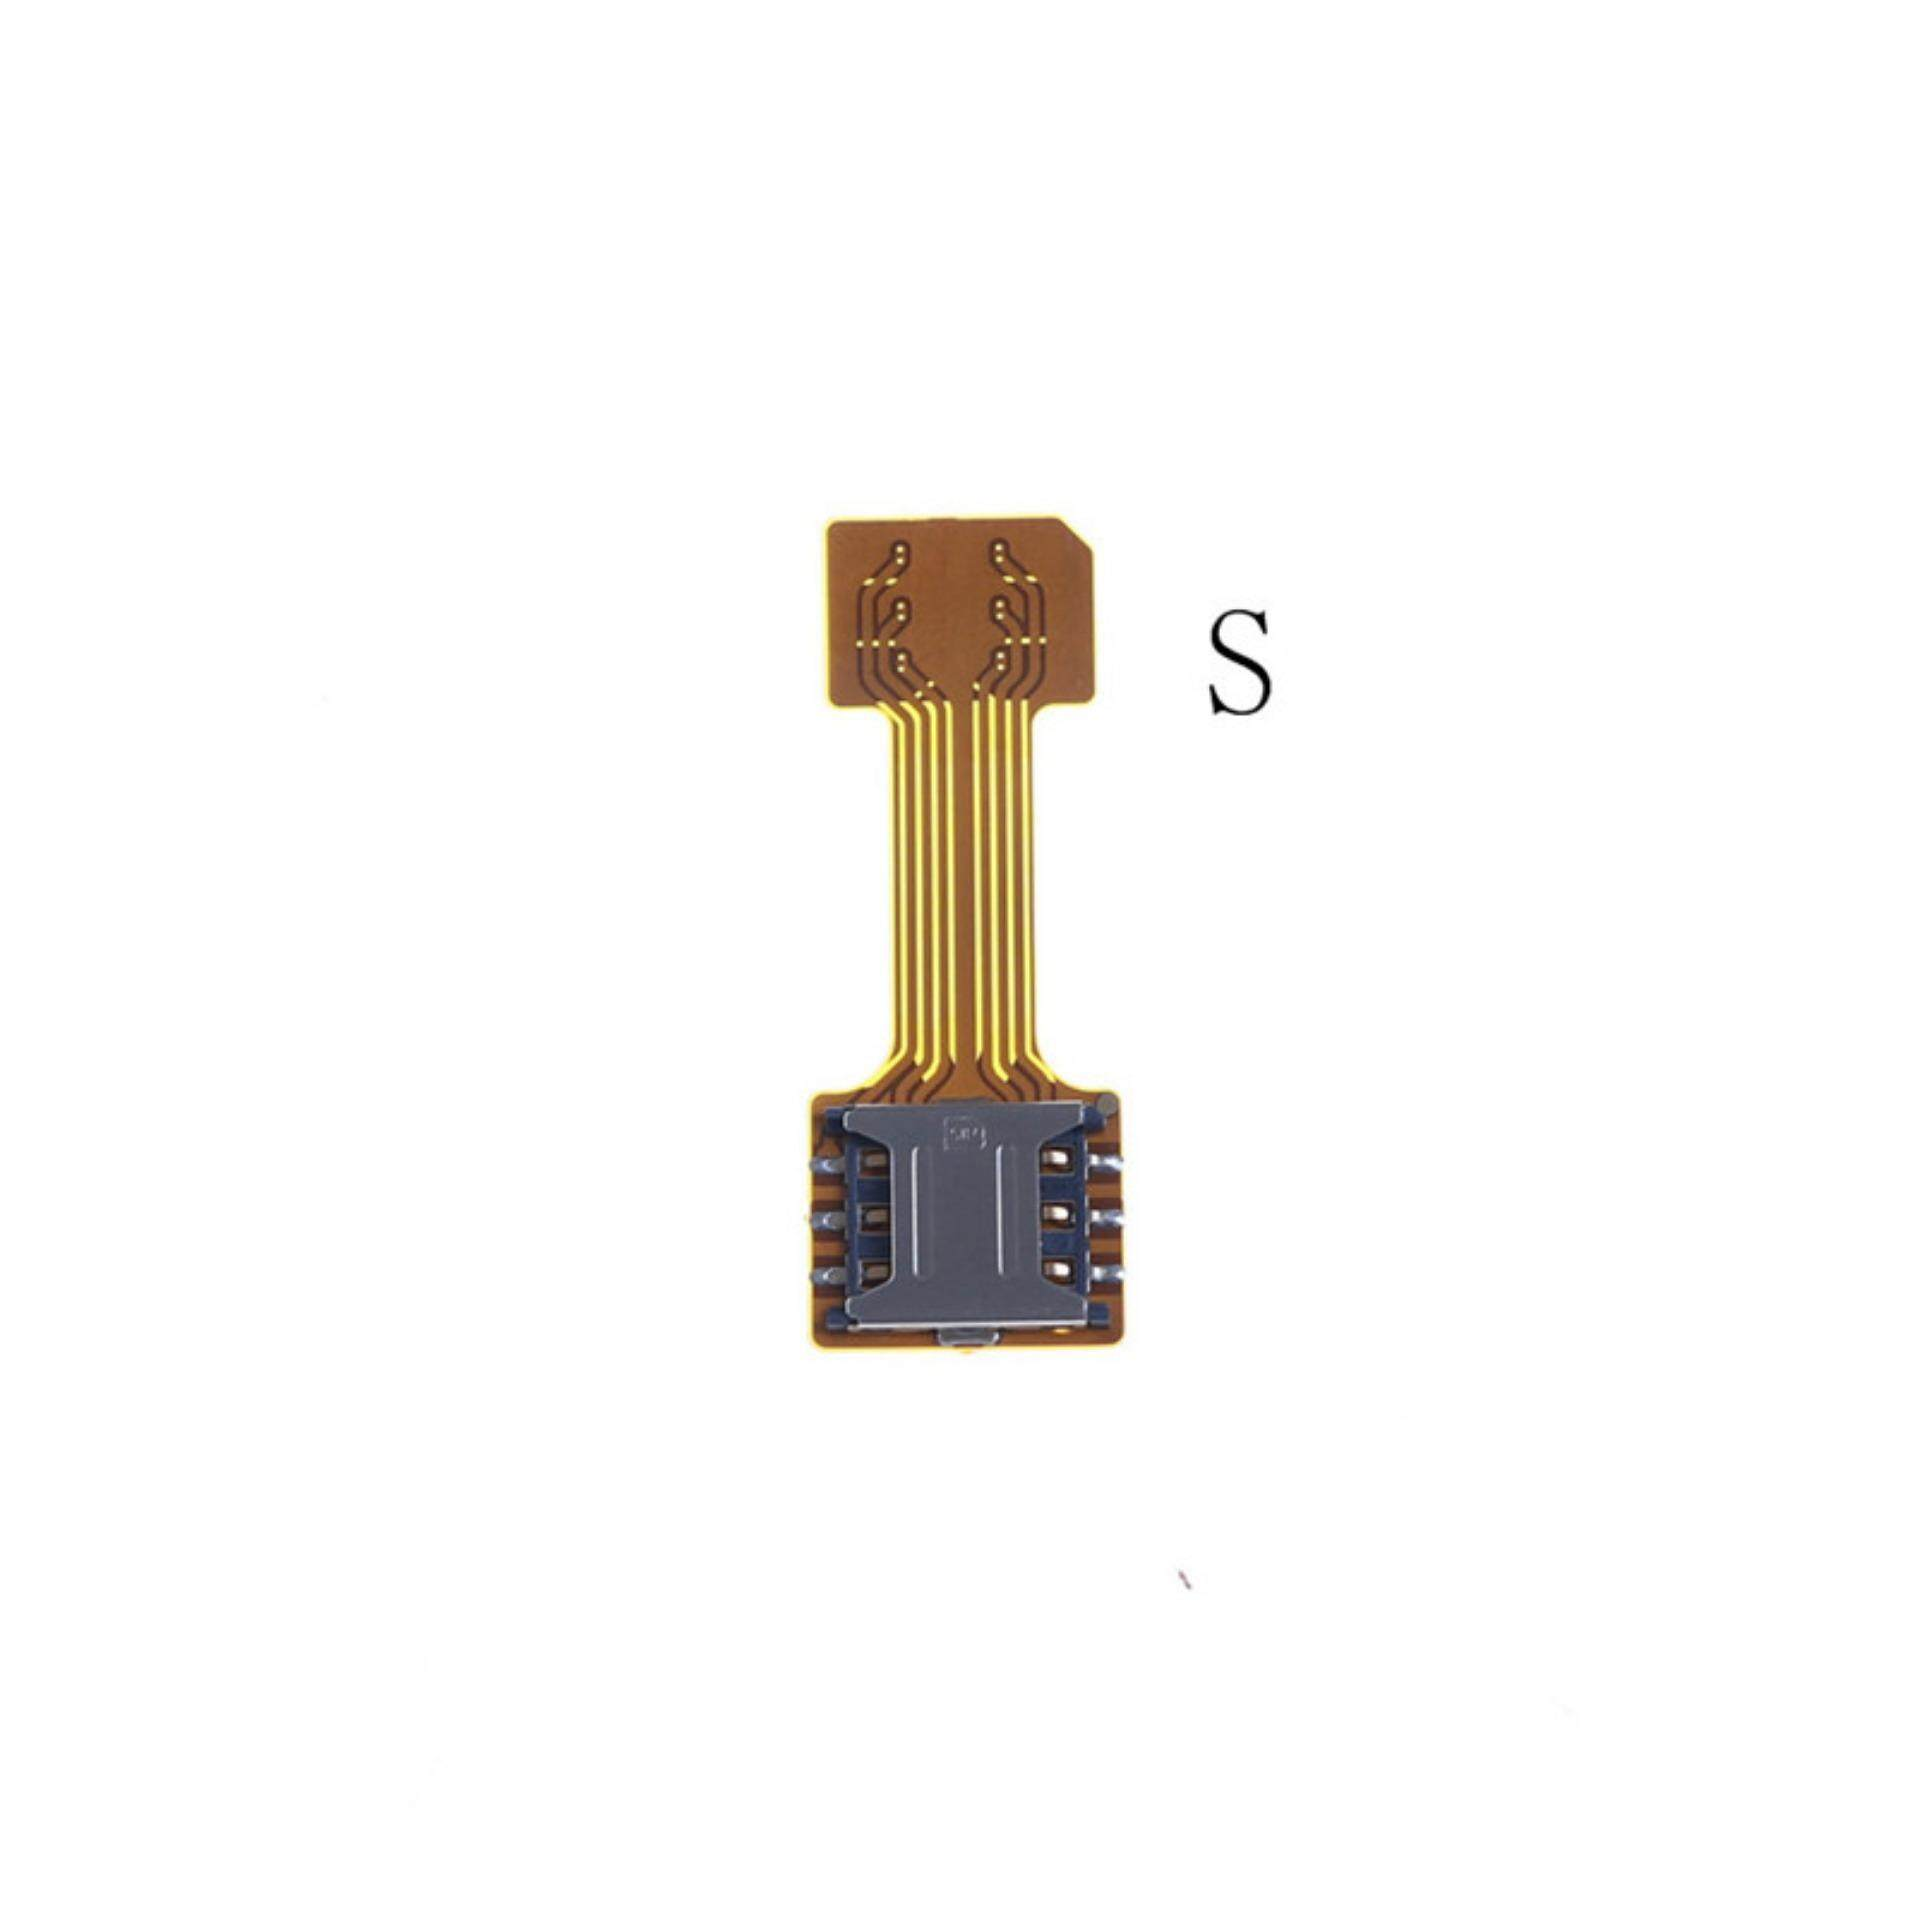 TF Hybrid Sim Slot Dual SIM Card Adapter Micro SIM Card Extender Android  Phone Useful